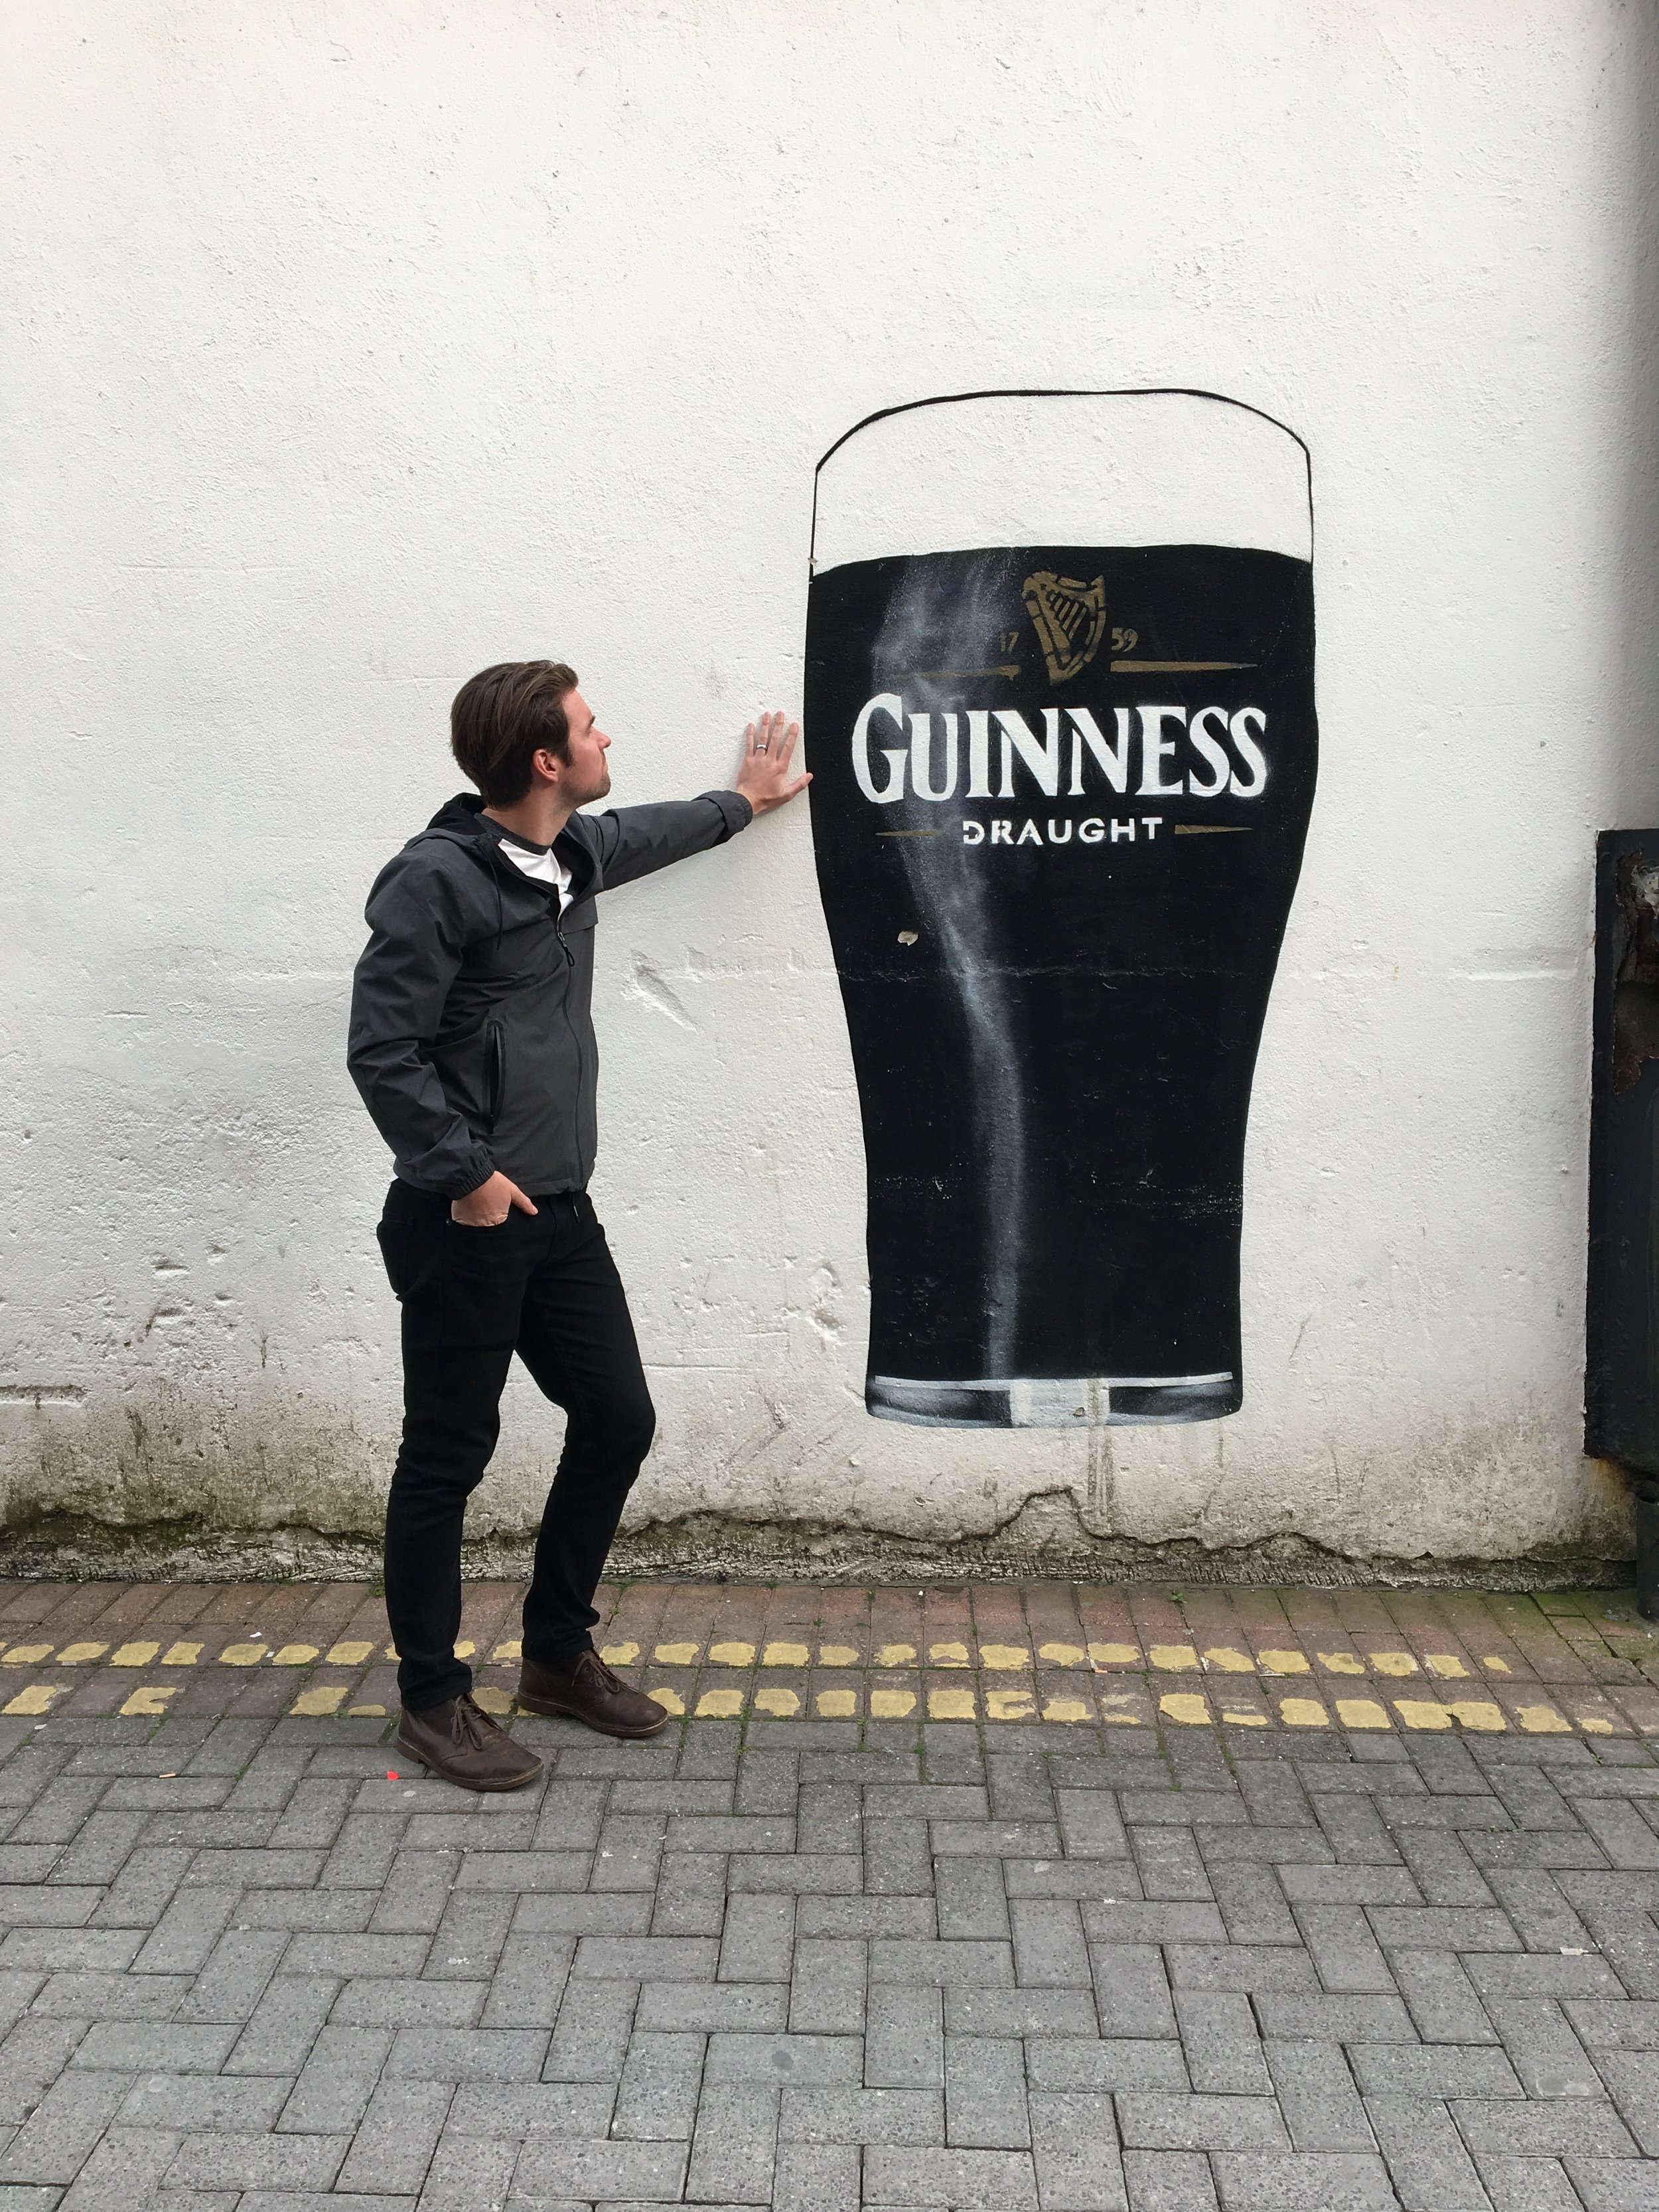 Killarney, County Kerry, Ireland - Things to do - Our 7 day Ireland Itinerary